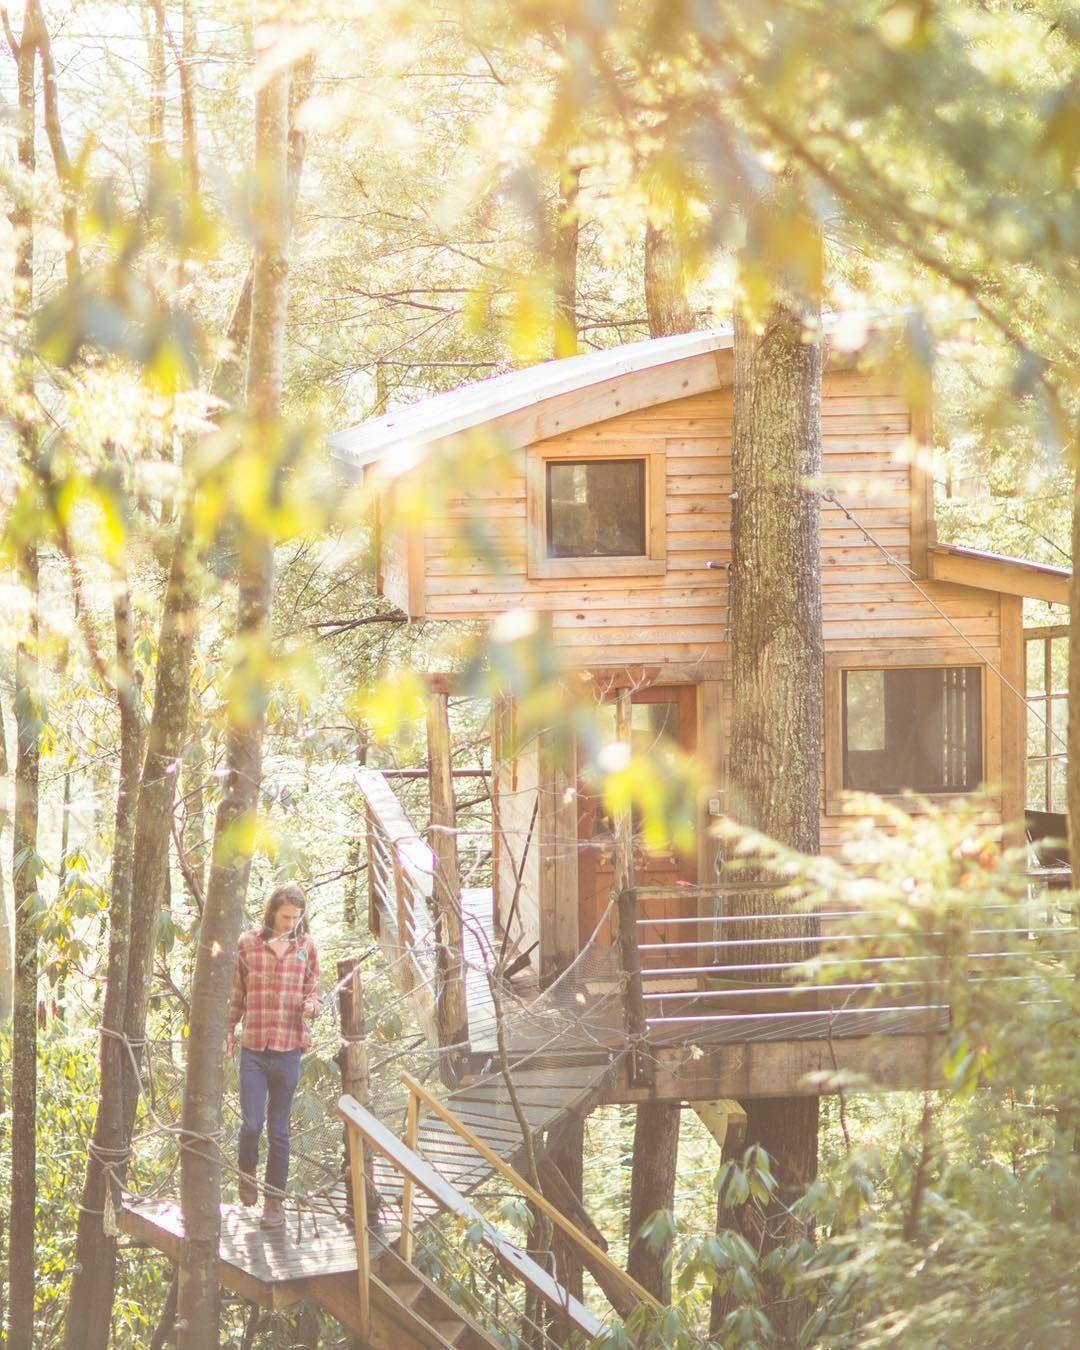 Basking photo by forestwoodward treehouserental